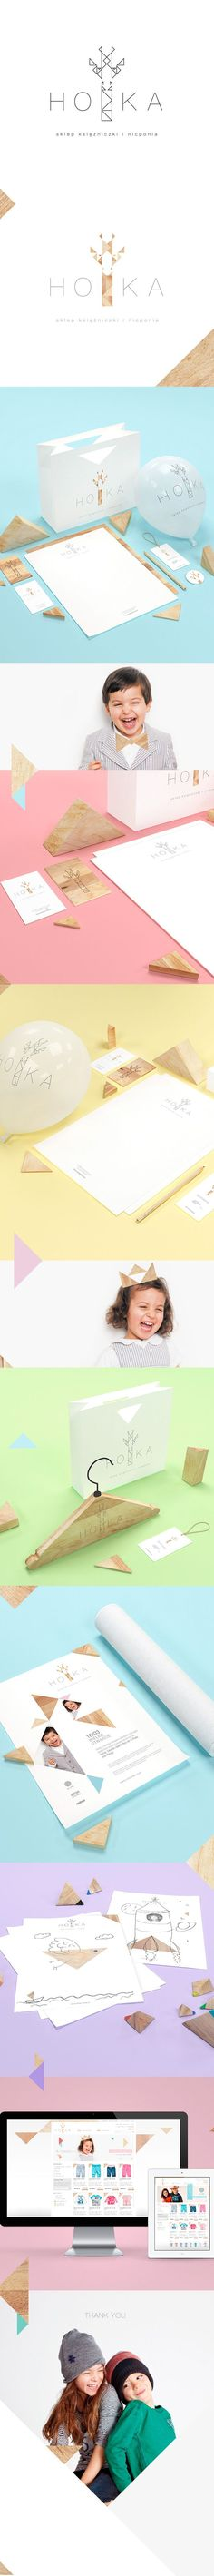 Hoka Branding | Fivestar Branding – Design and Branding Agency & Inspiration Gallery